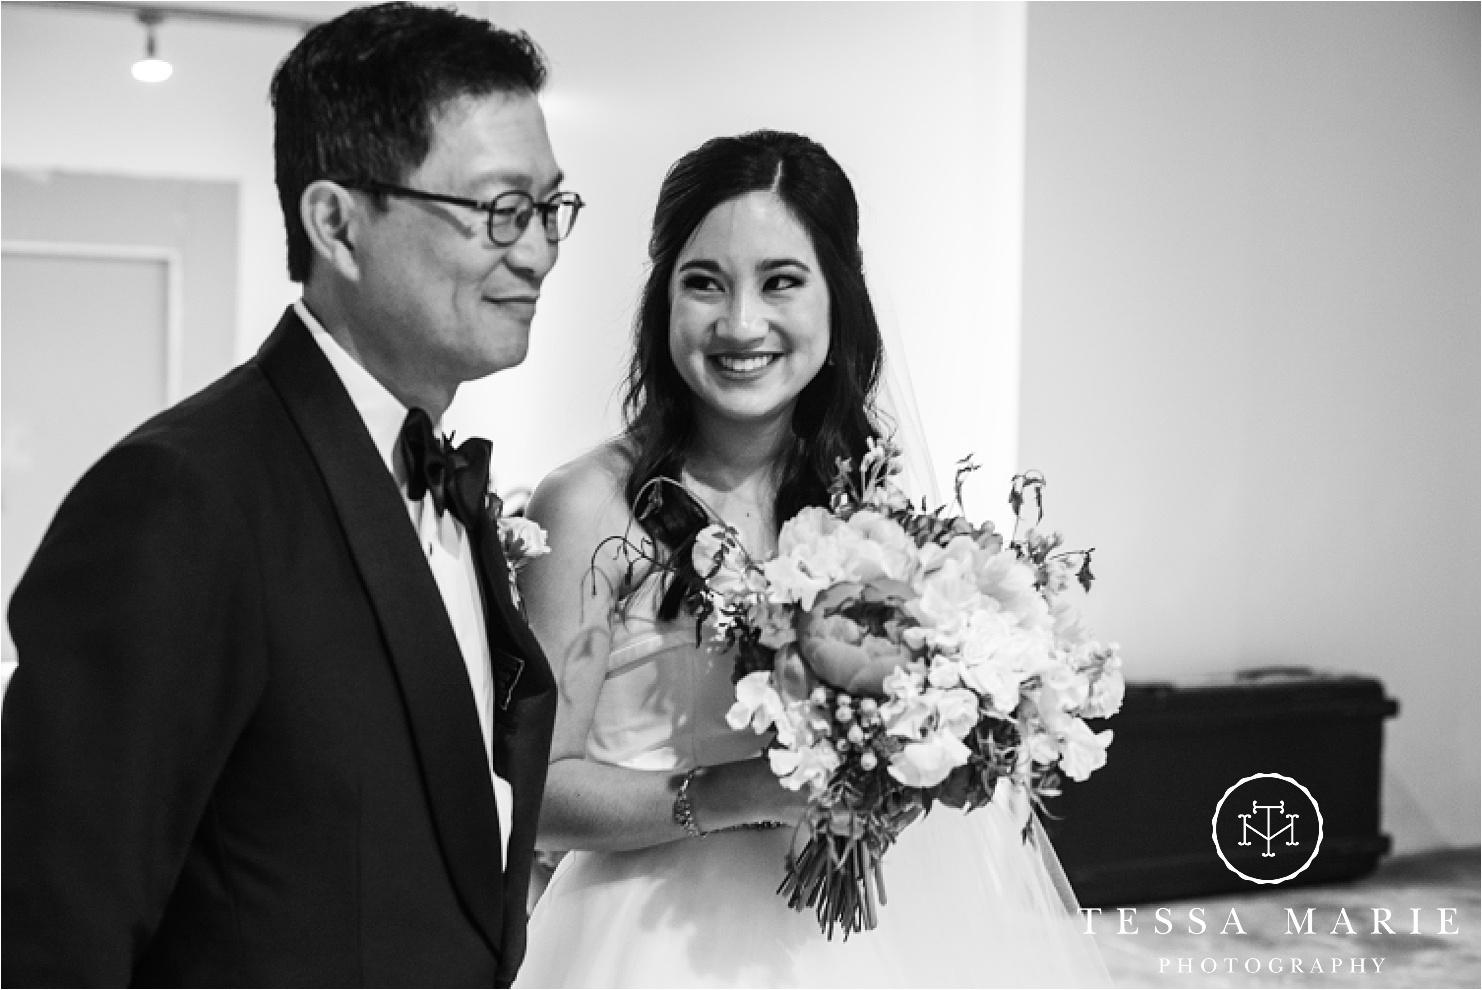 Tessa_marie_weddings_houston_wedding_photographer_The_astorian_0107.jpg